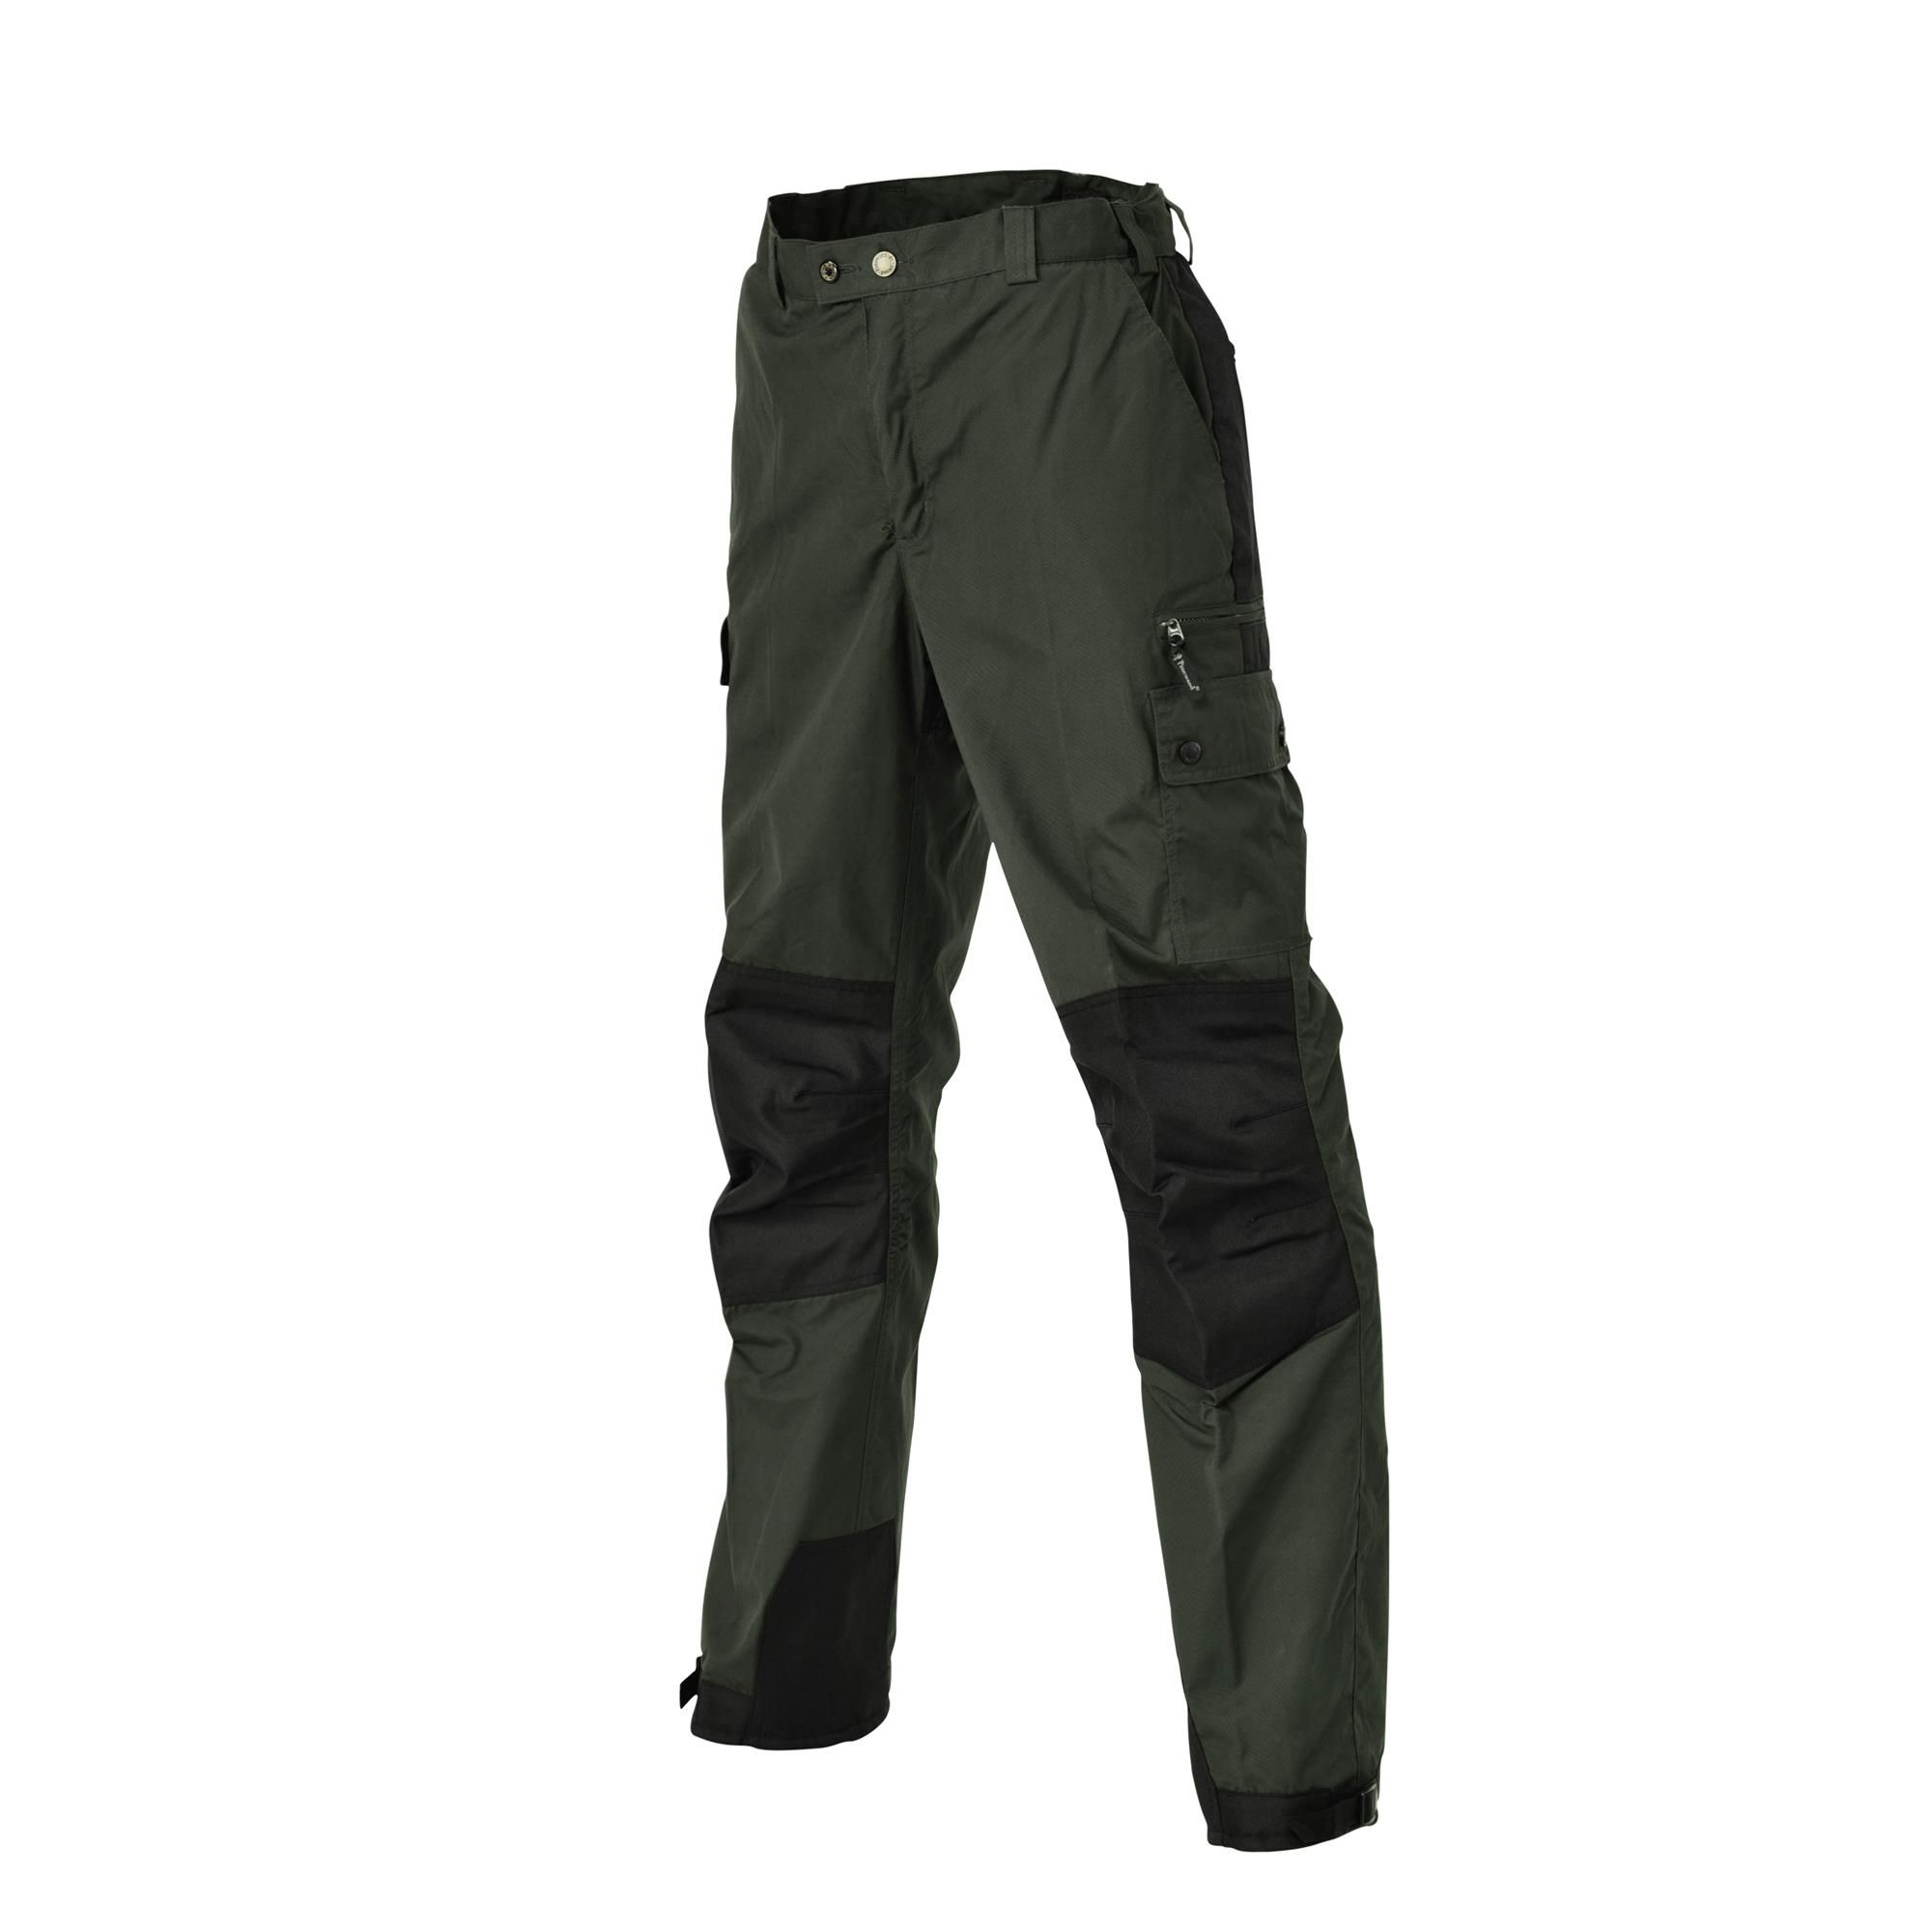 5d5d647b5a7ef7 Xtend-Angebote Pinewood Lappland Hose Herren grau Gr. 50  Category   Outdoorbekleidung